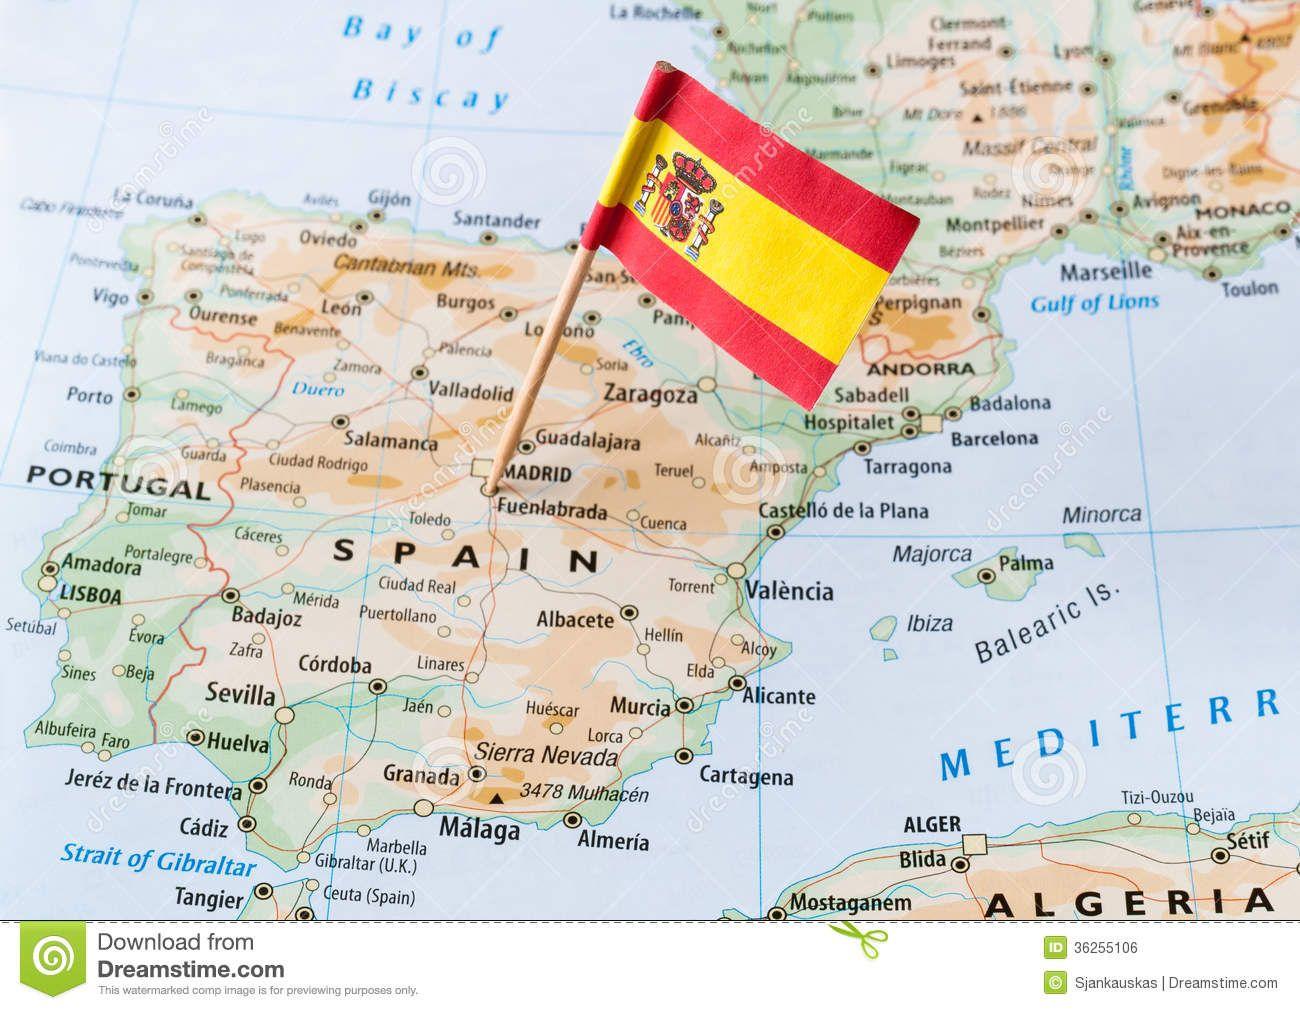 Jerez De La Frontera Karte.Spain Paper Flag Pin On A Map Travel Stock Photos In 2019 Spain